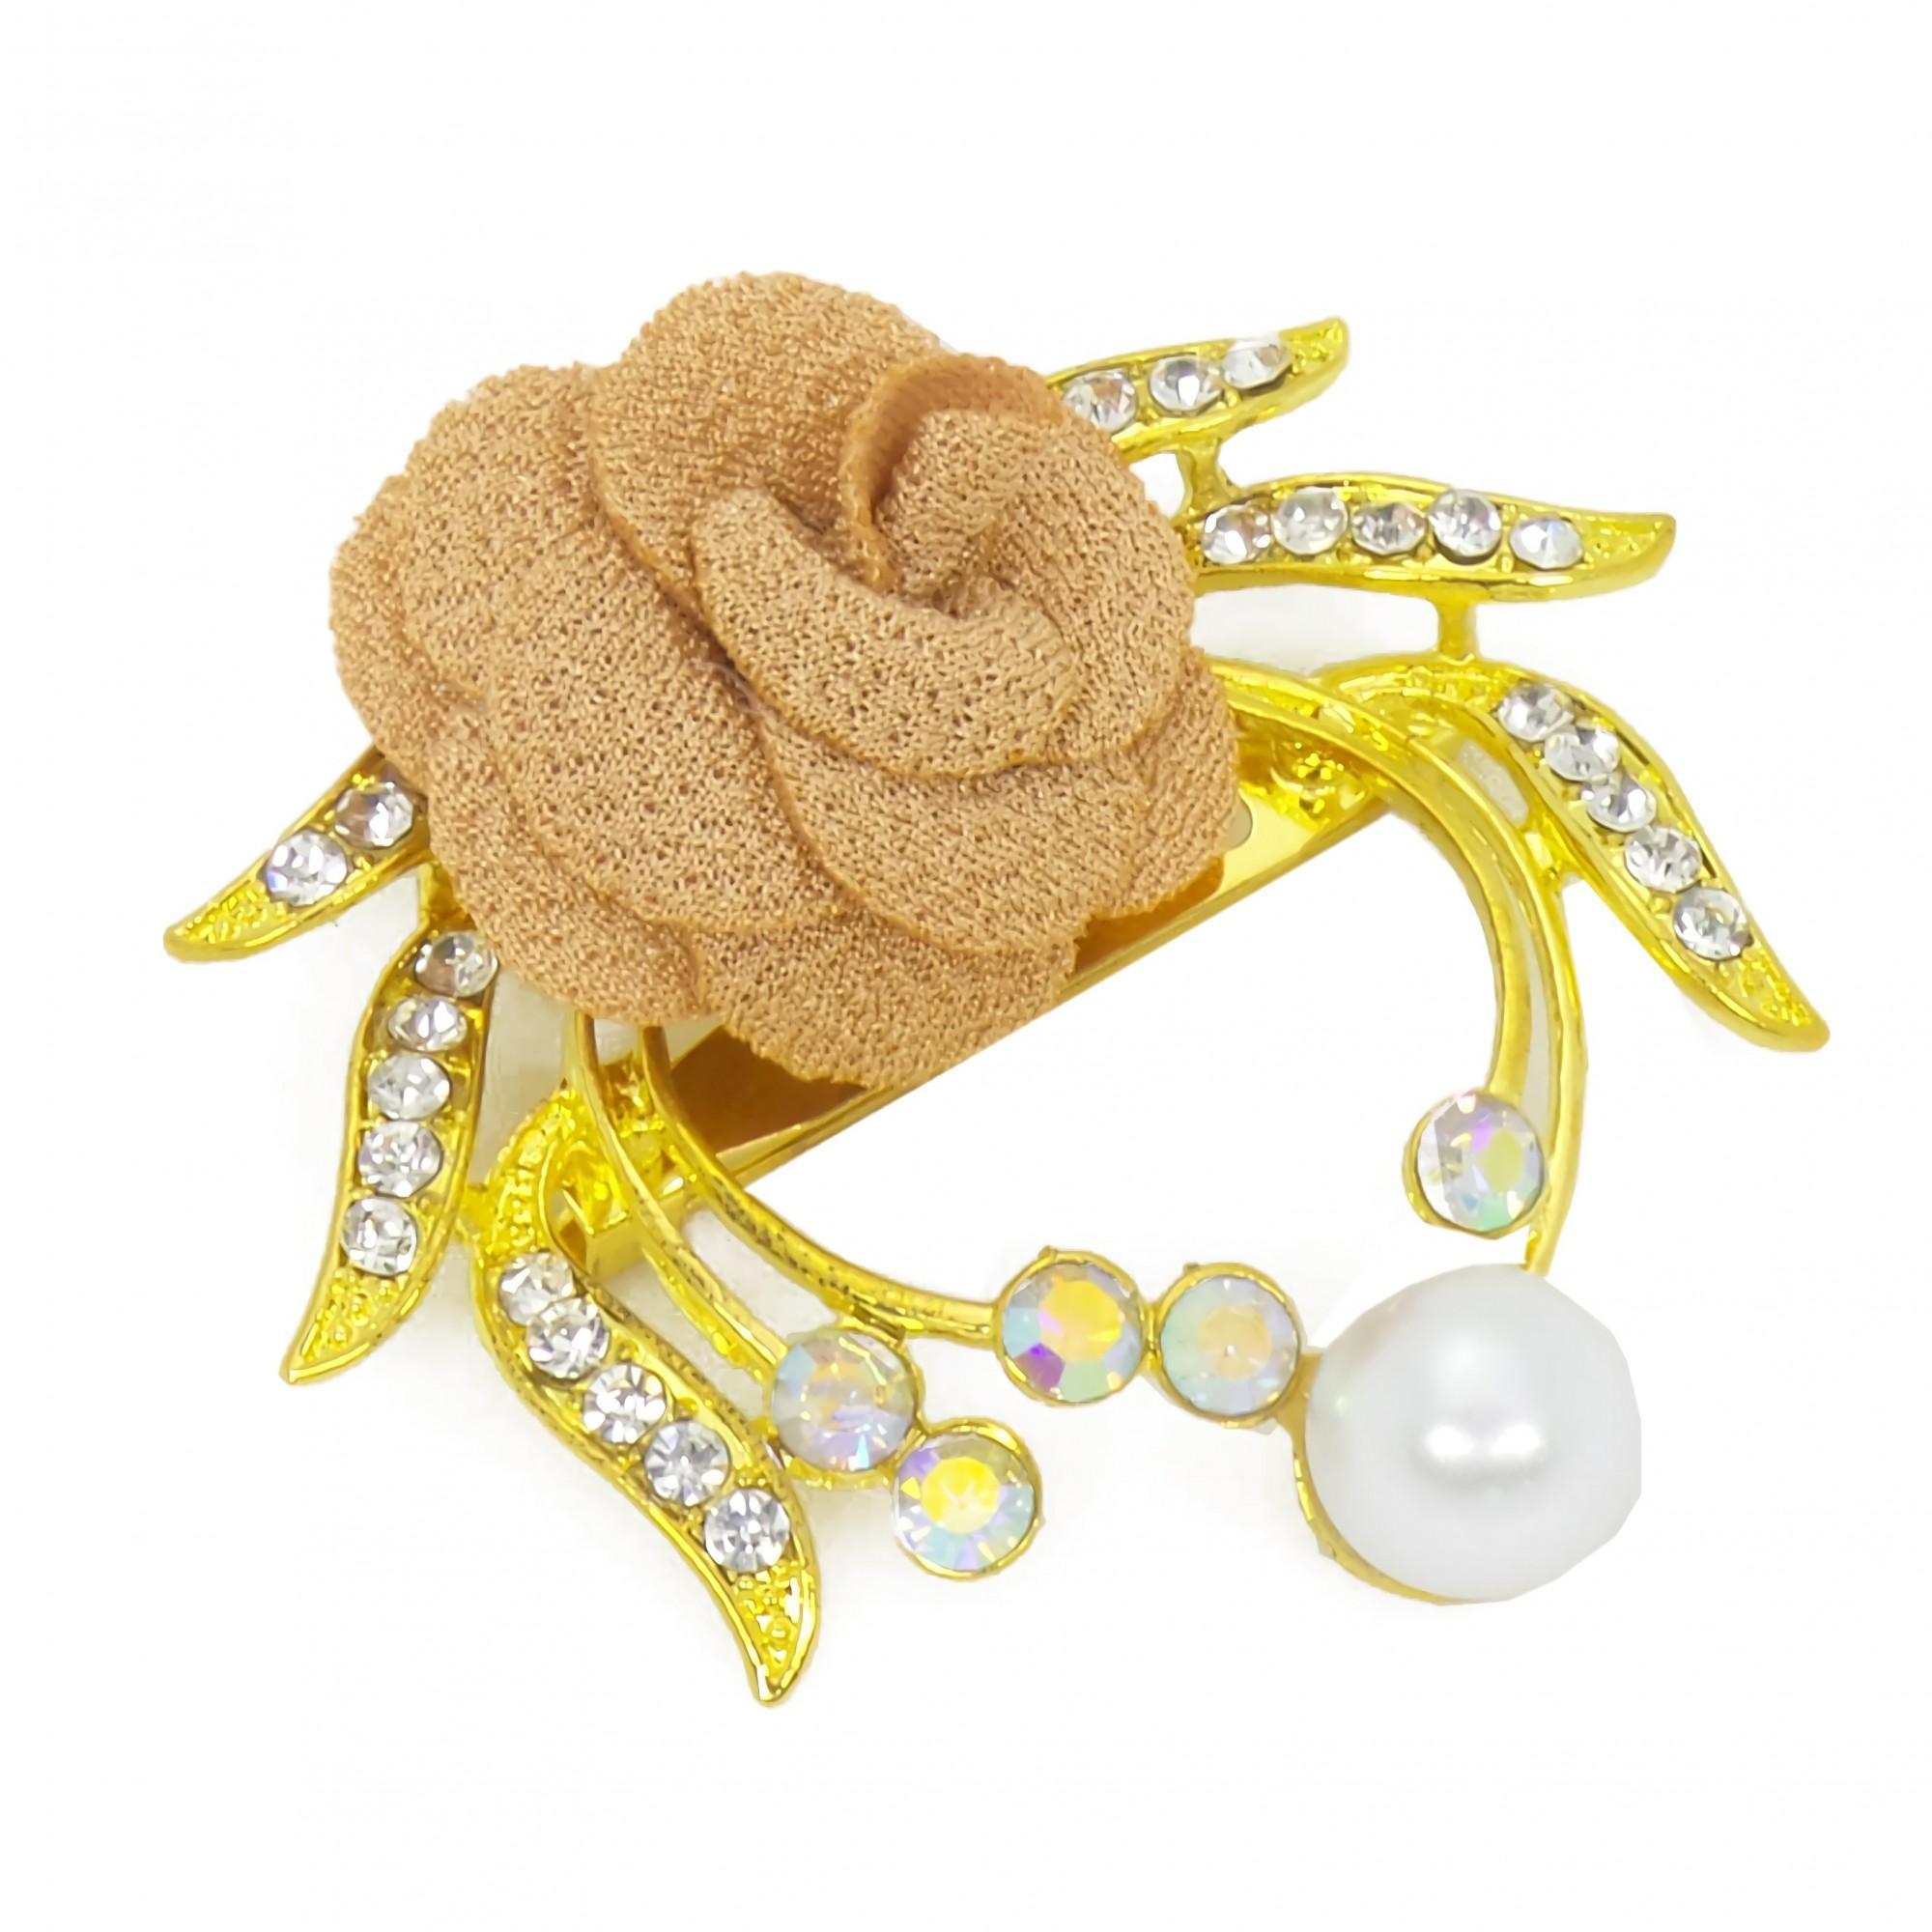 OFASHION Aksesoris Bros [1 Pcs] CA-618-B Hijab Jilbab Mawar Fashion Jewelry Xuping Emas Coklat